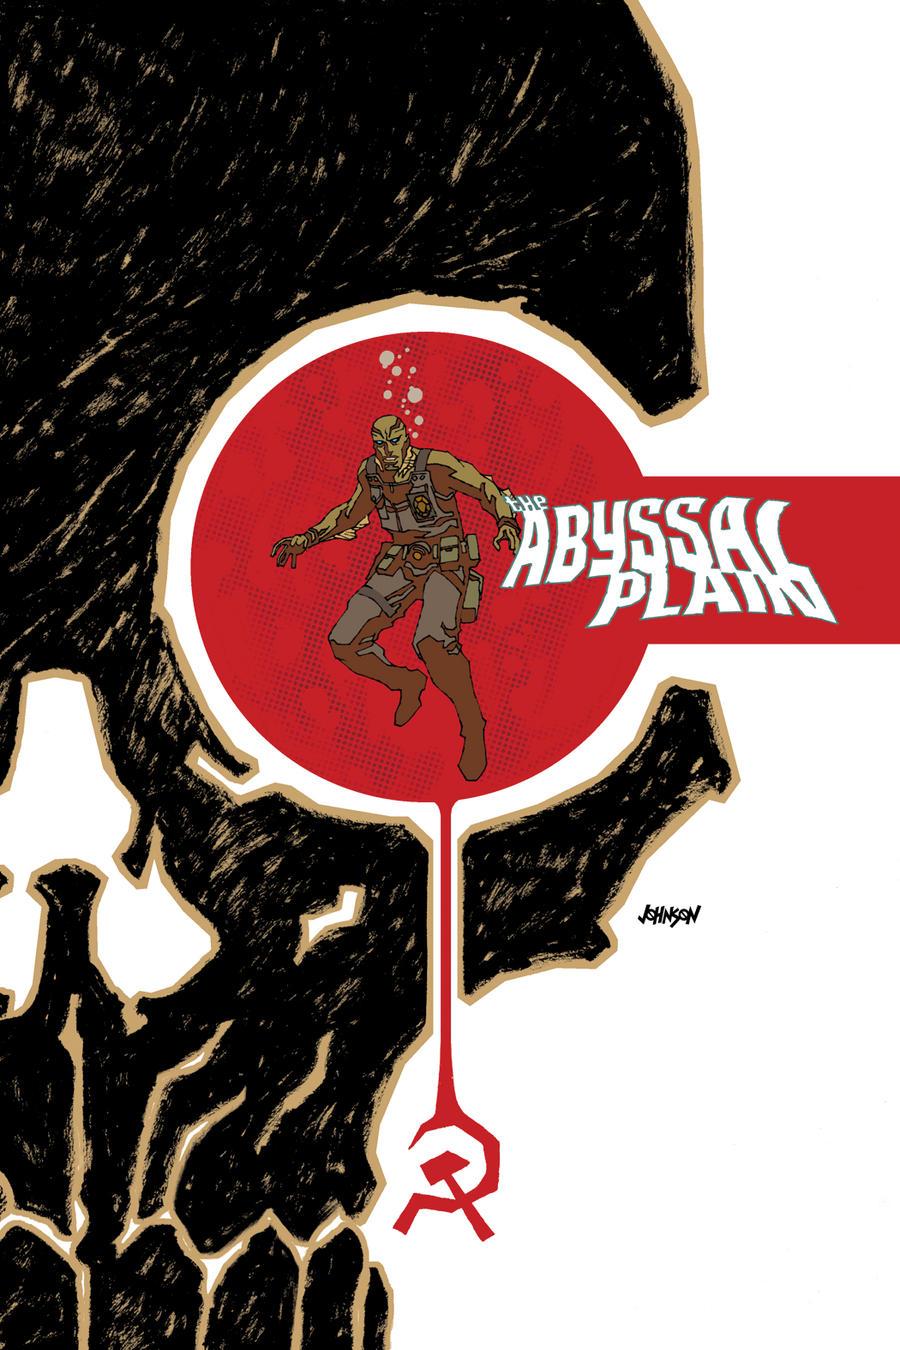 Abe Sapien Abyssal Plain 2 by Devilpig